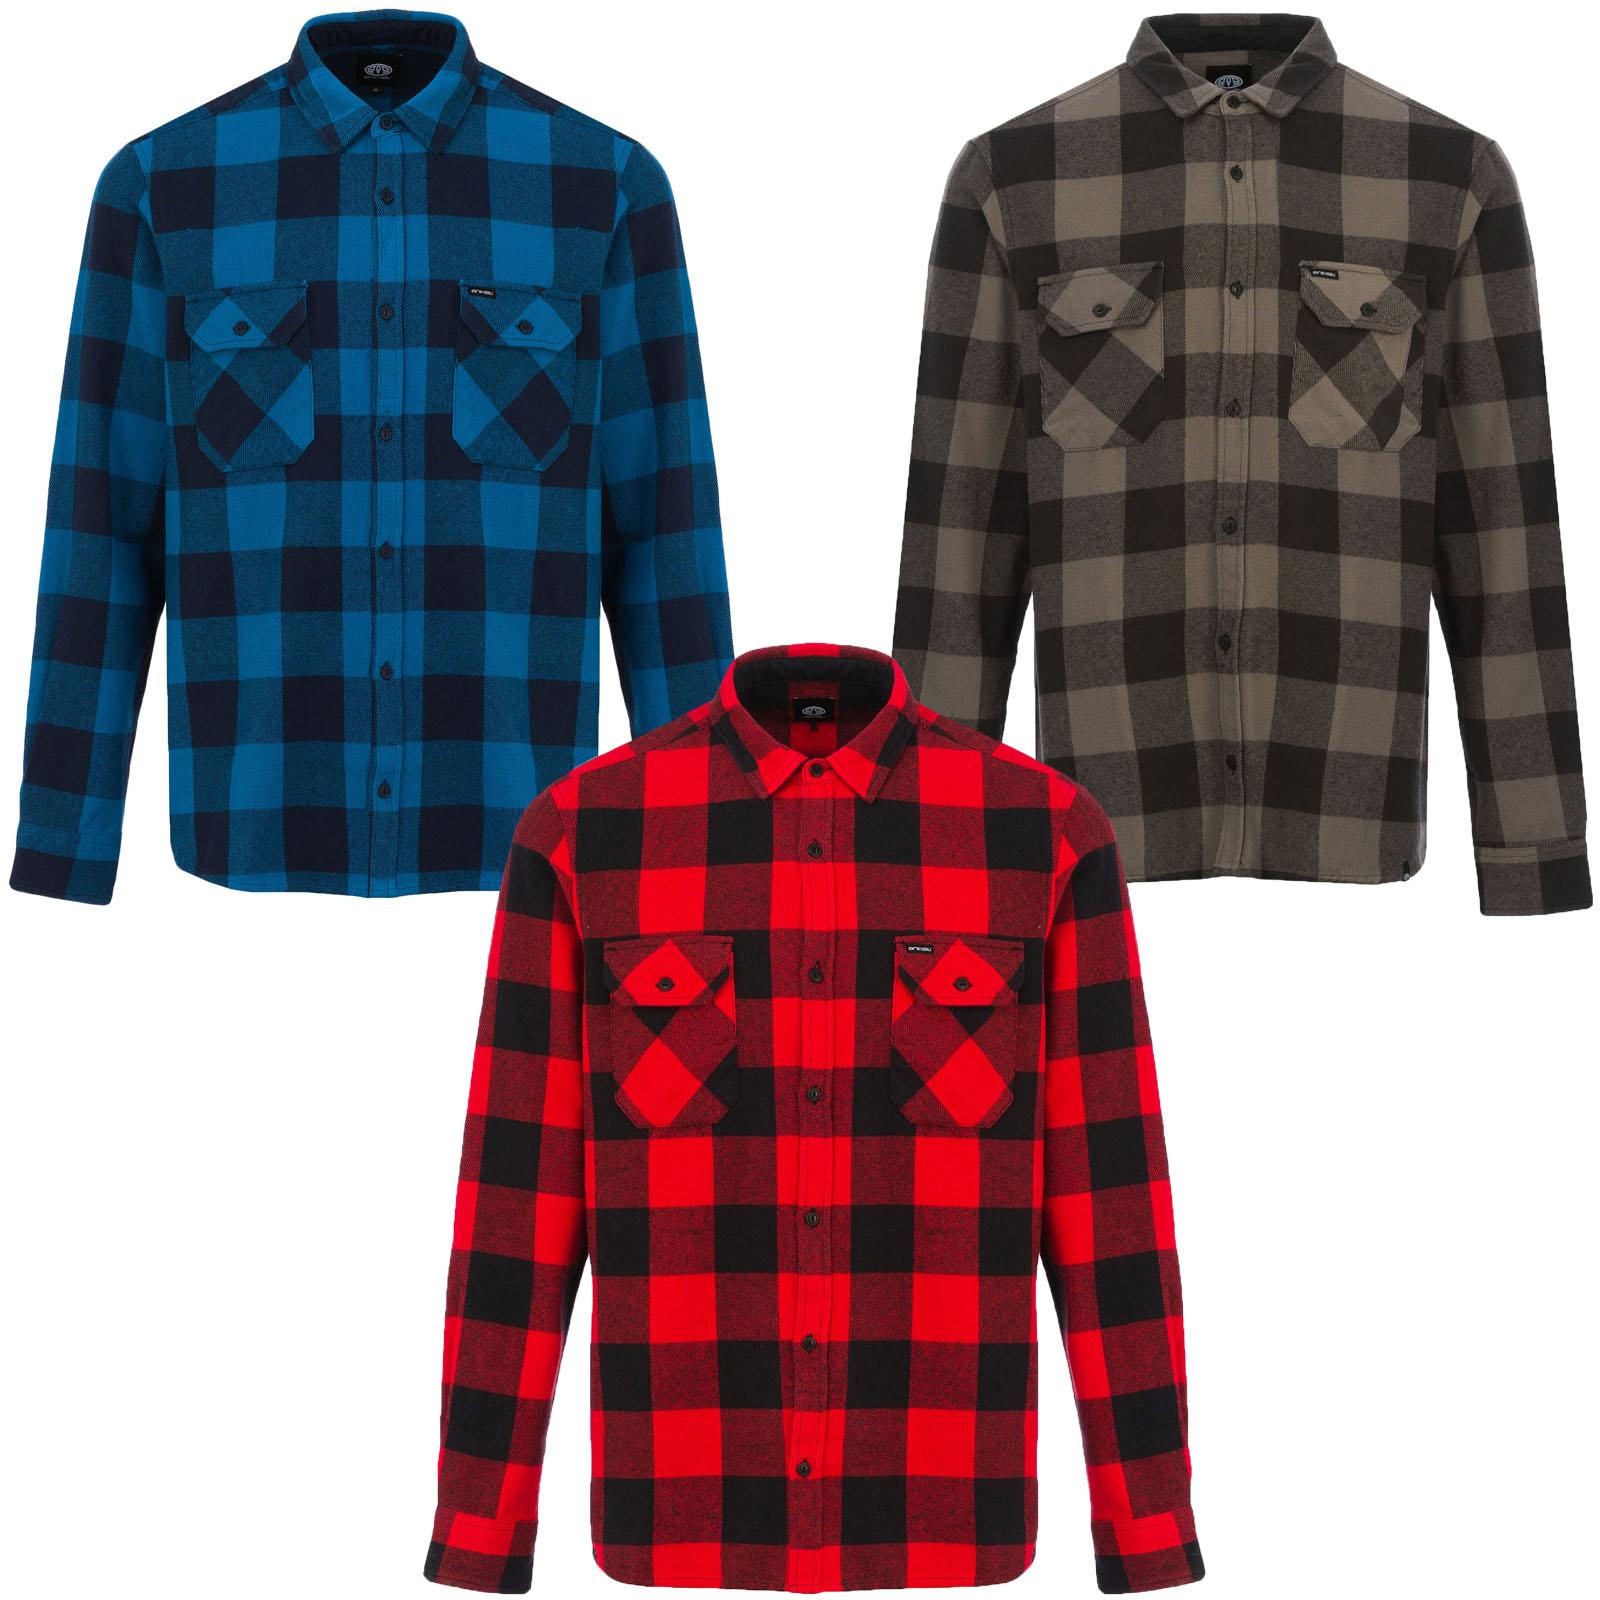 Details about Animal Mens Shovel Checked Long Sleeve 2 Pocket Casual Cotton Lumberjack  Shirt 24971dea5